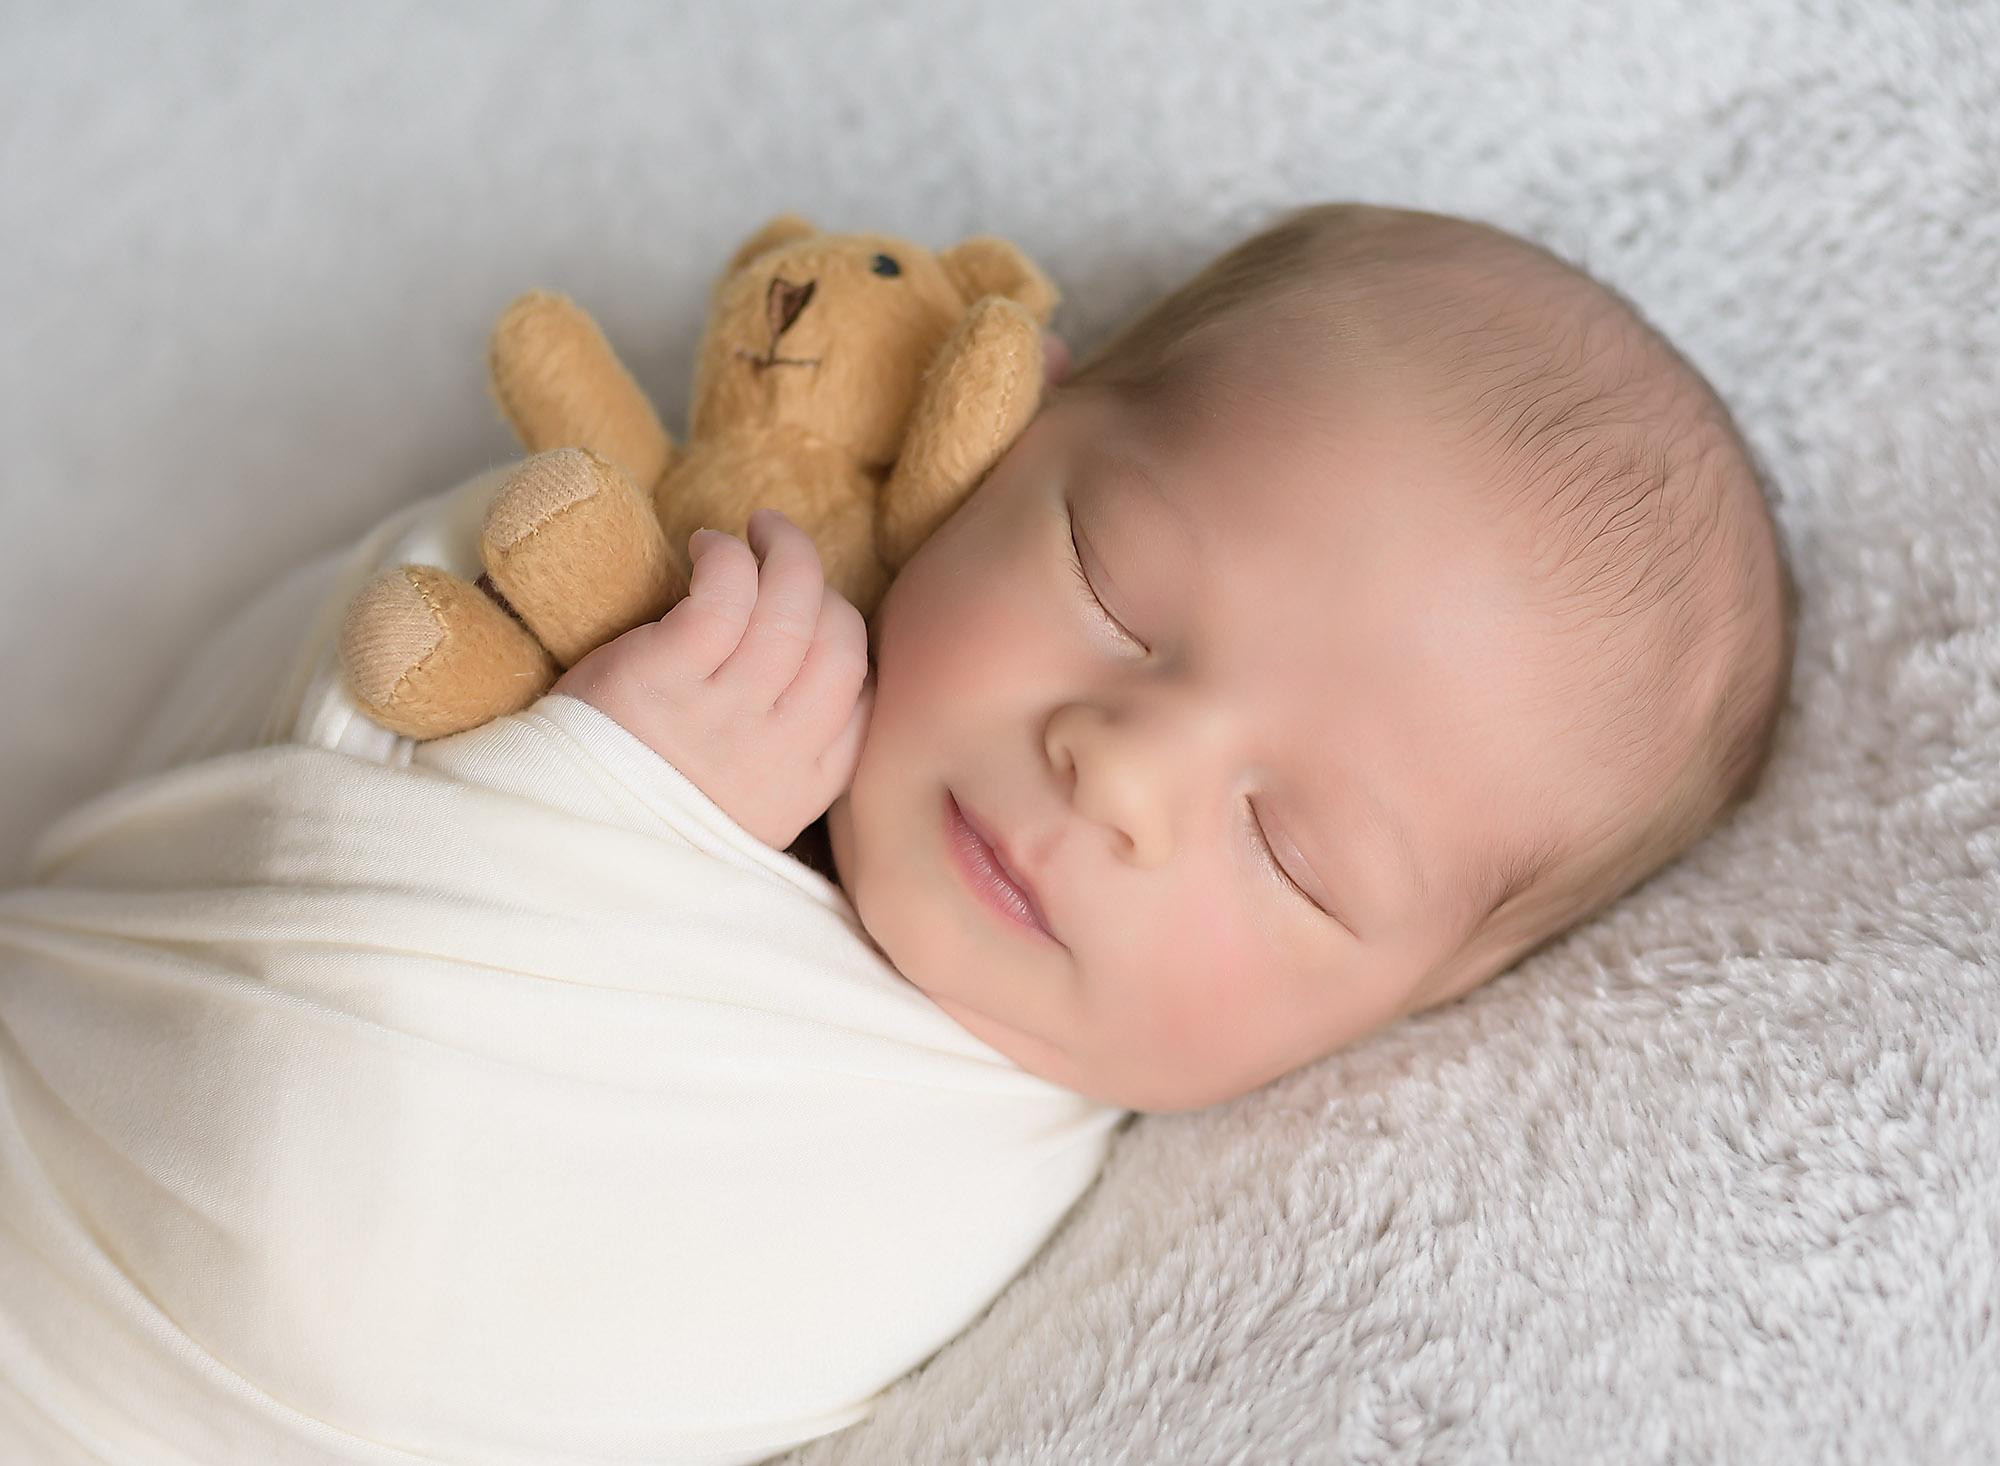 Newborn with Teddy Bear.jpg